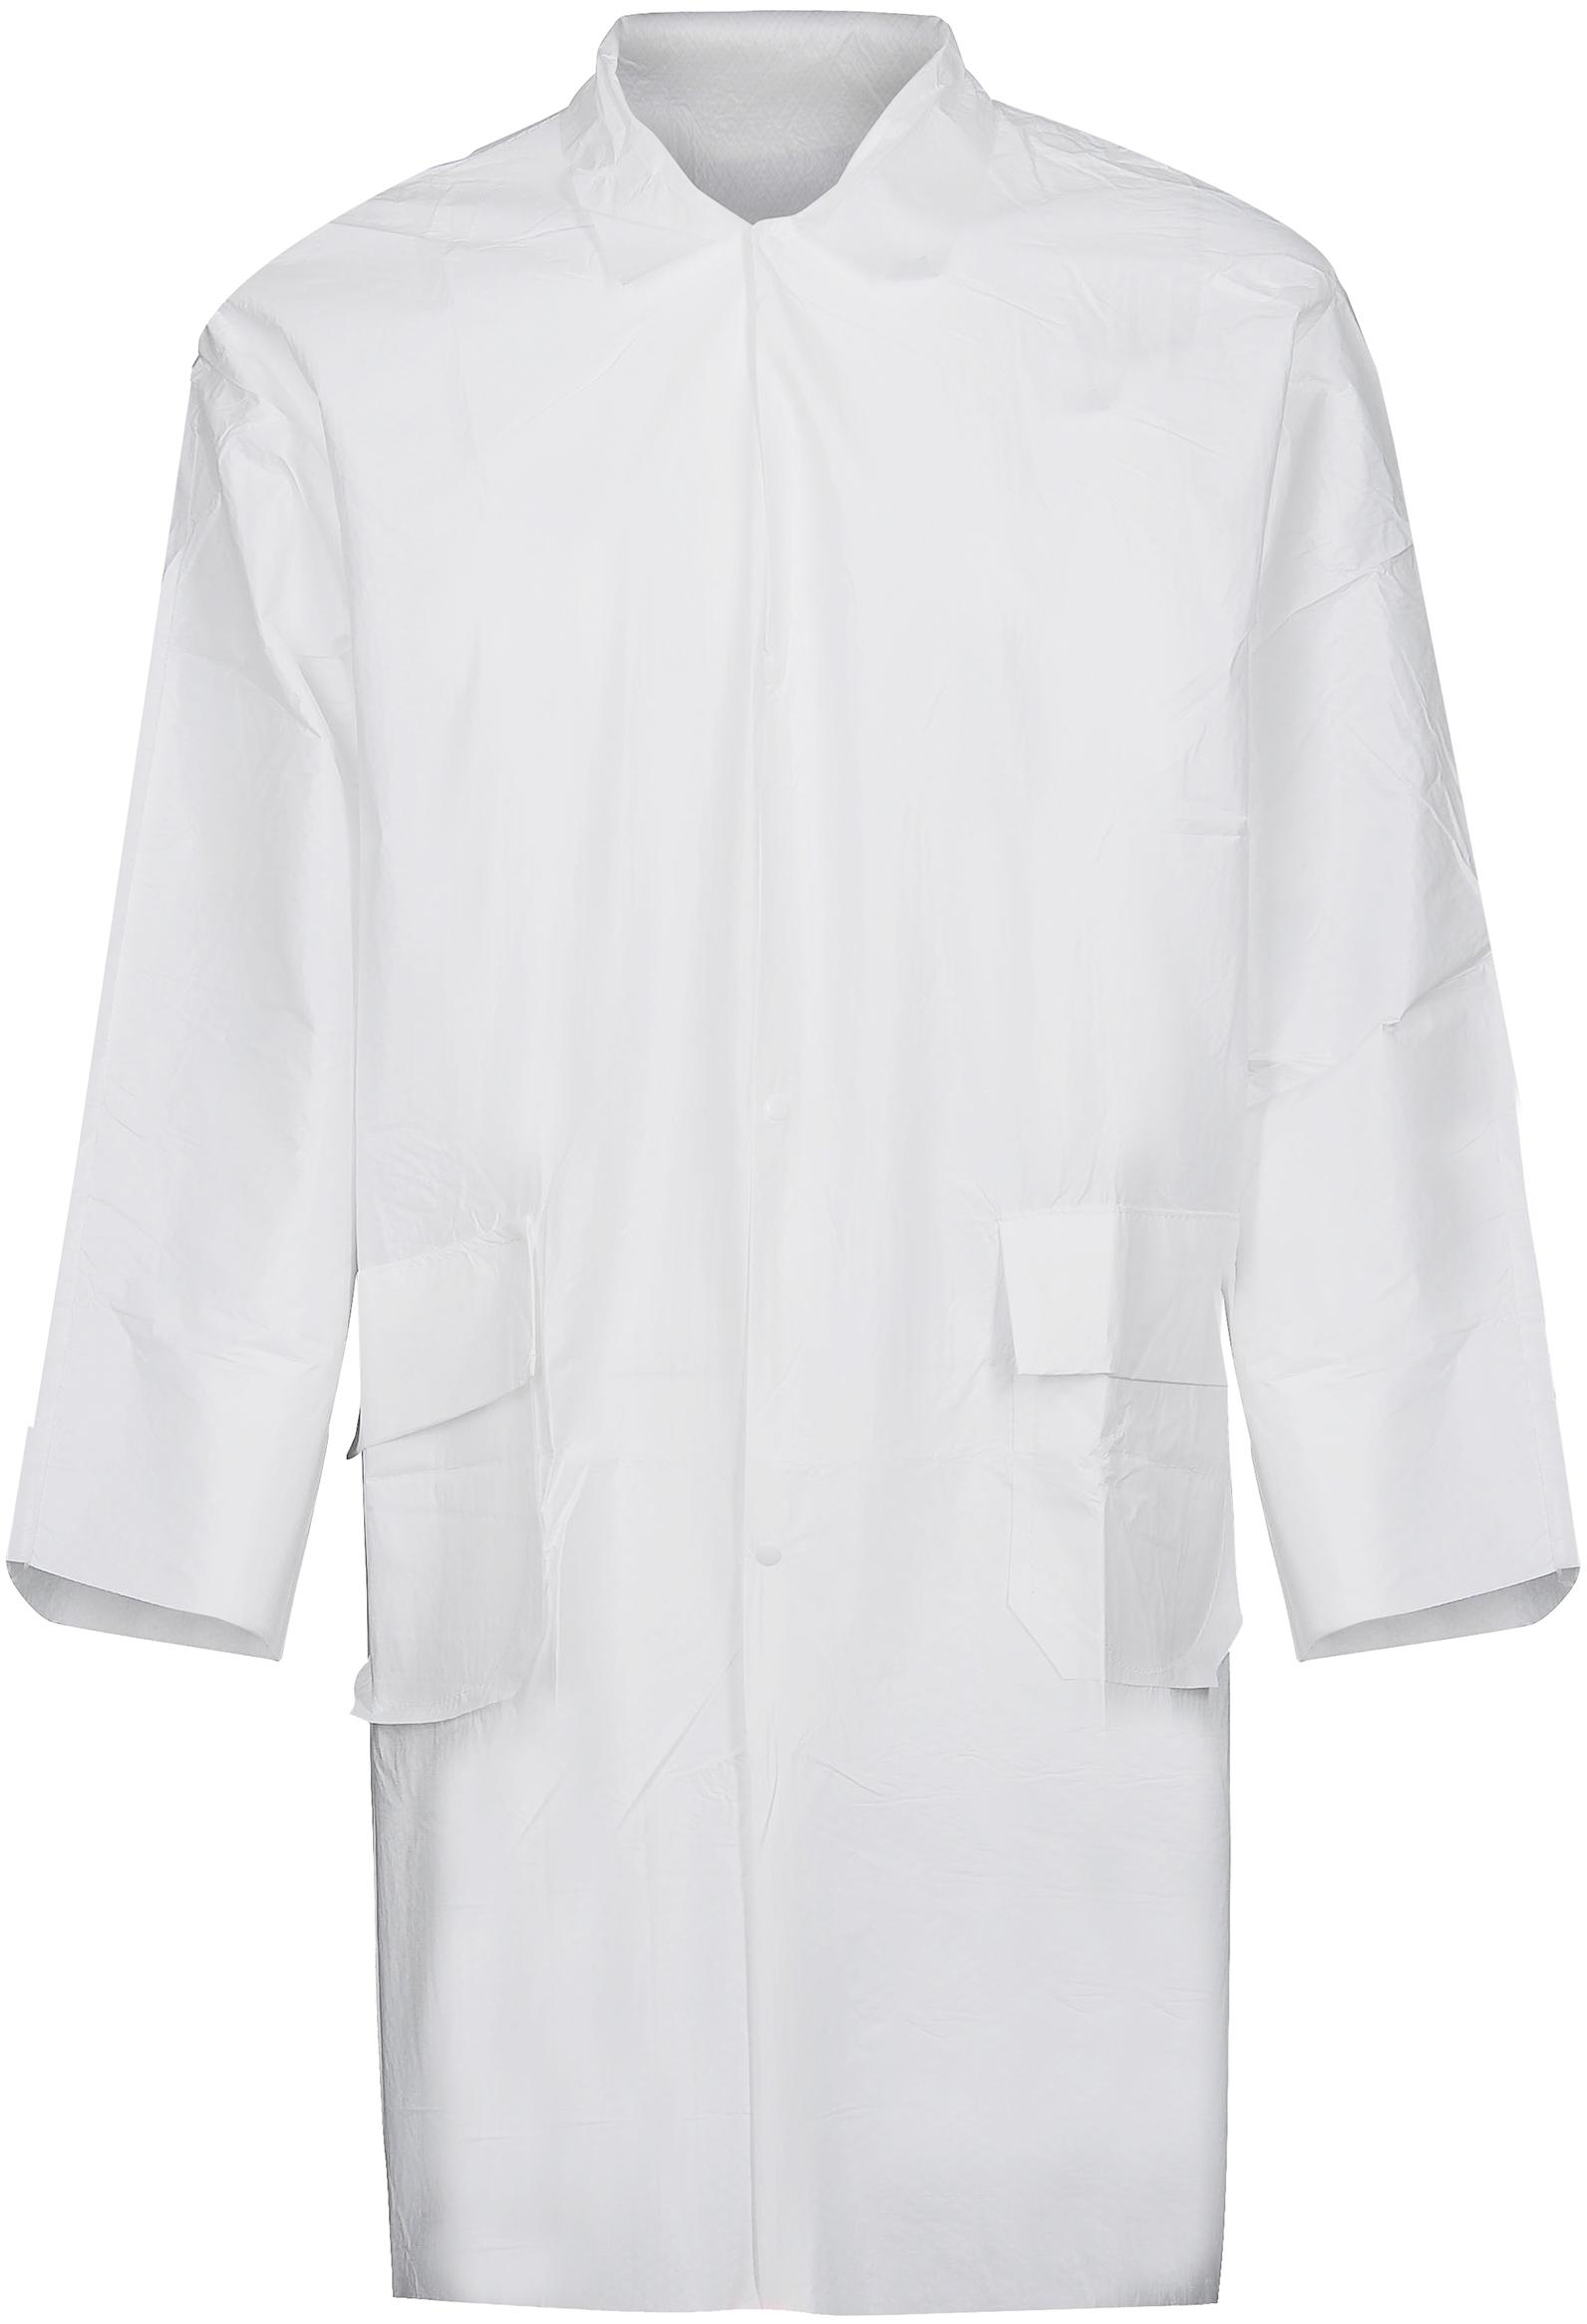 CoverStar® Kittel in weiß